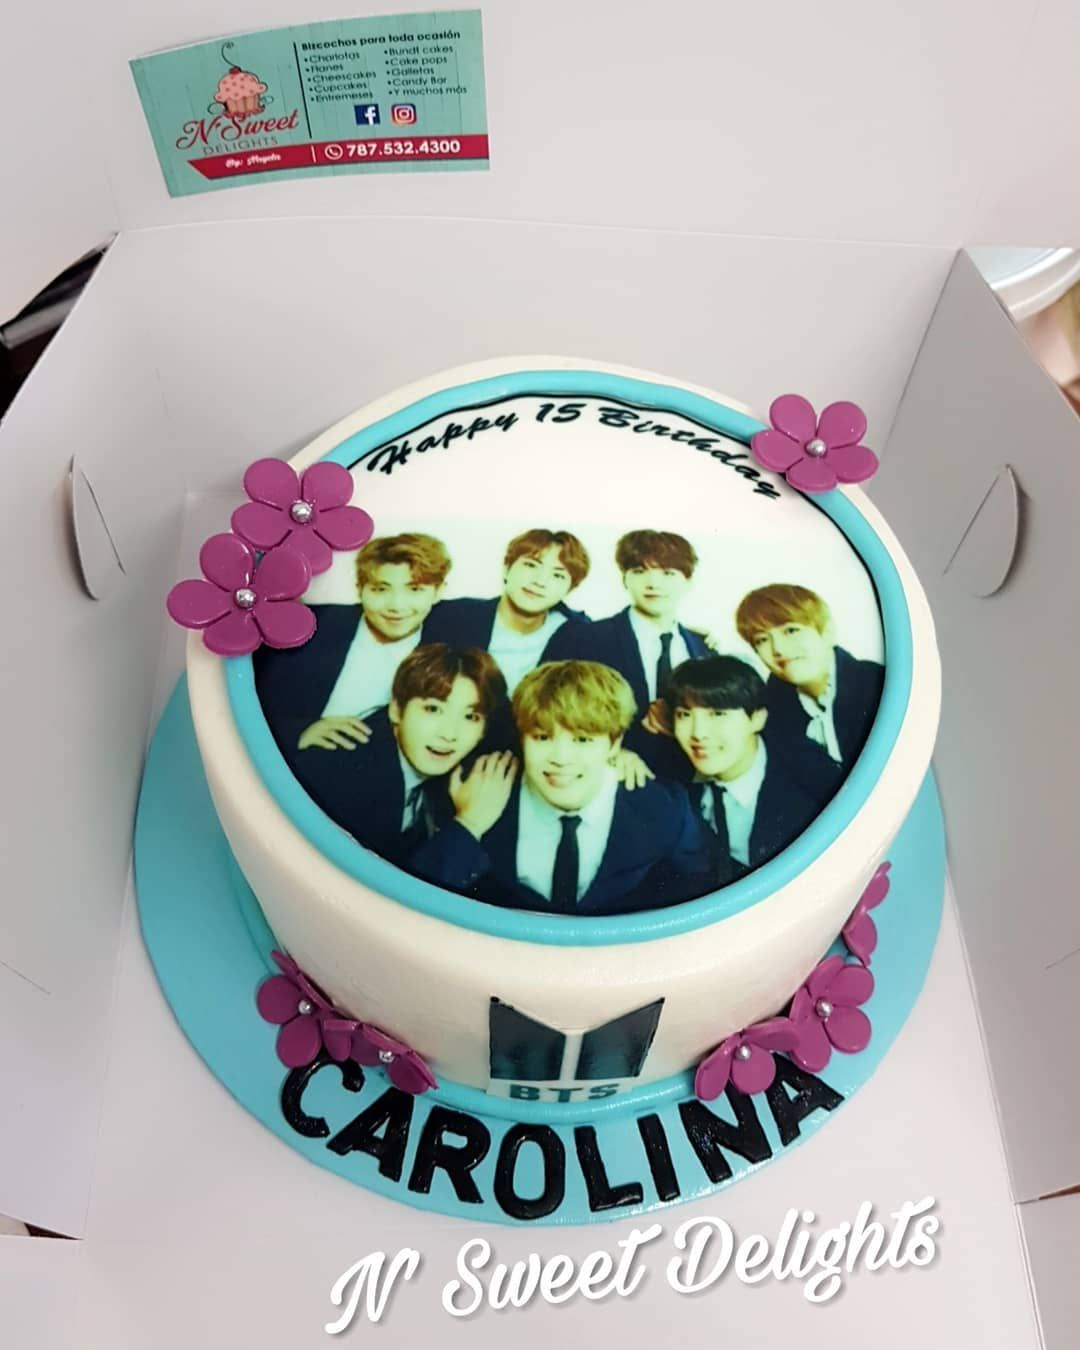 Bts Birthday Cake Nsweetdelights Btscake Birthdaycake Bts Cake Bts Birthdays Cake